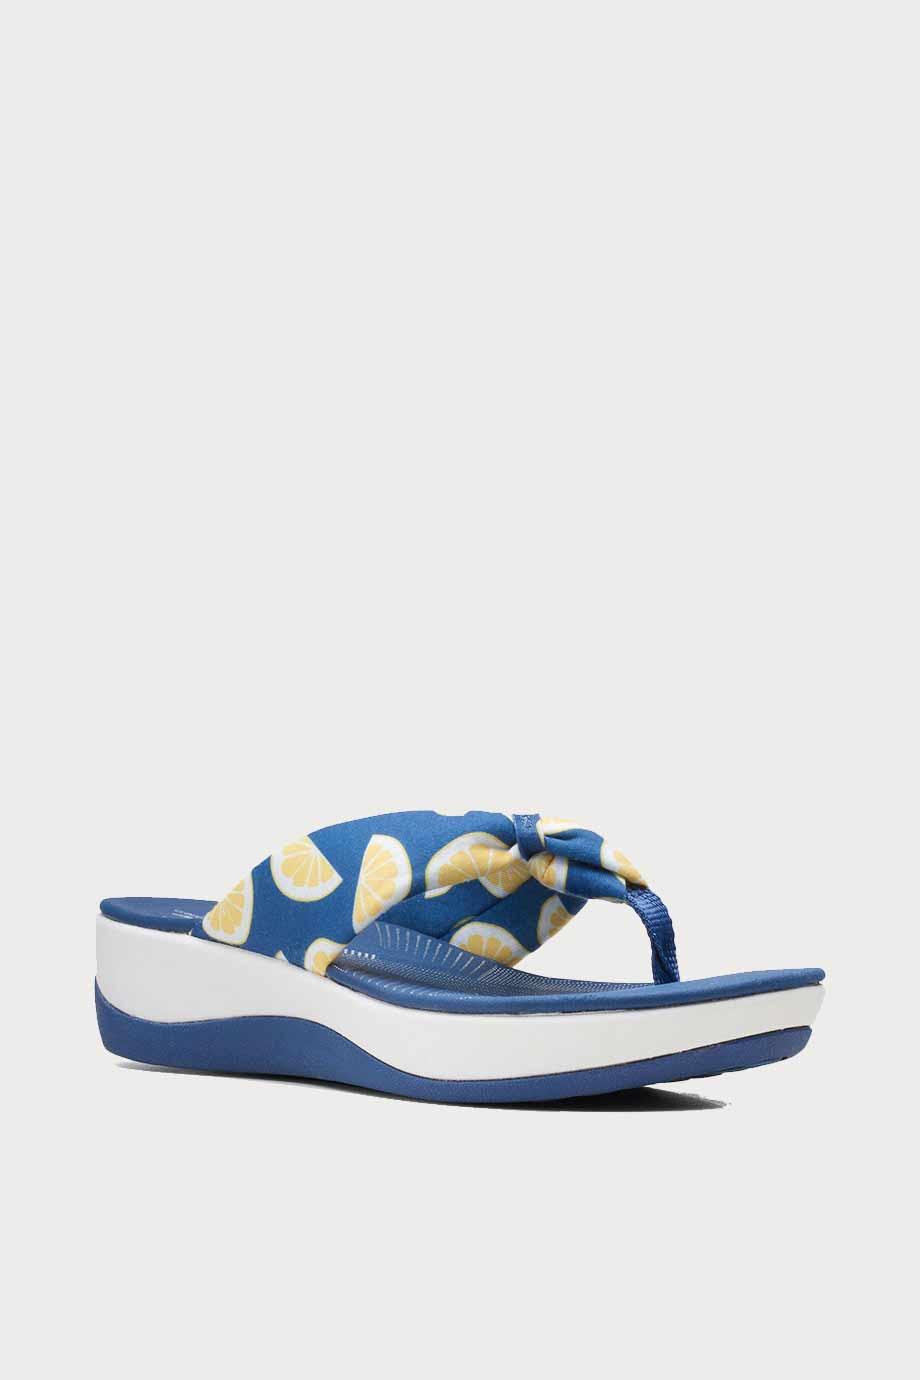 spiridoula metheniti shoes xalkida p Arla Glison clarks blue interest 4